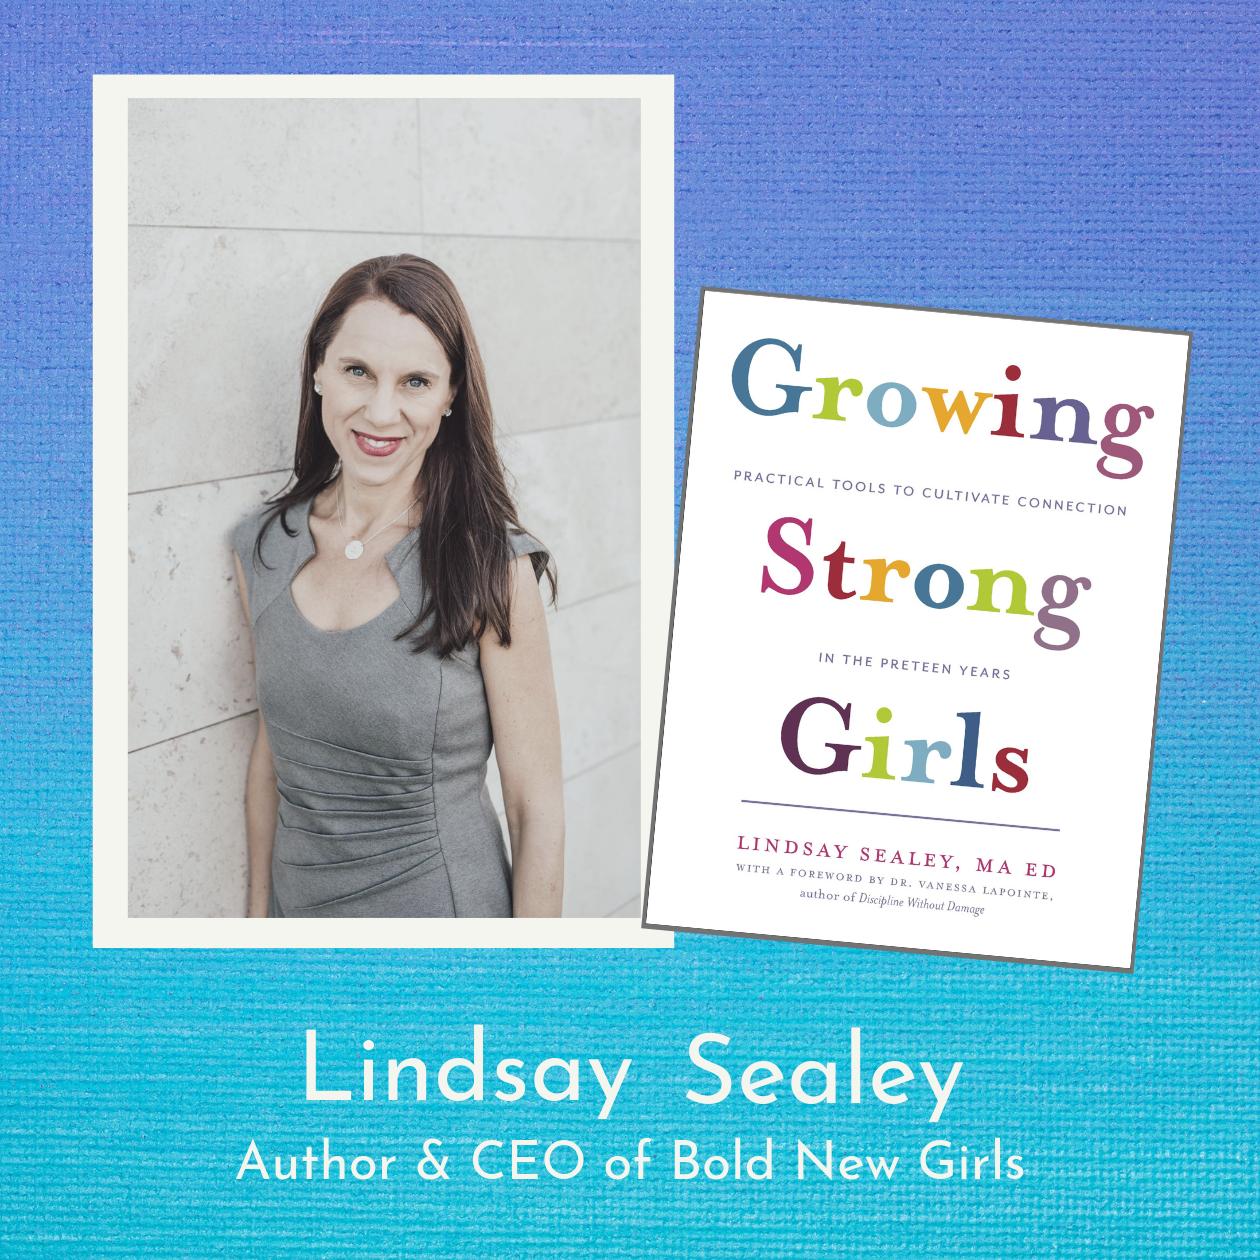 Lindsay Sealey